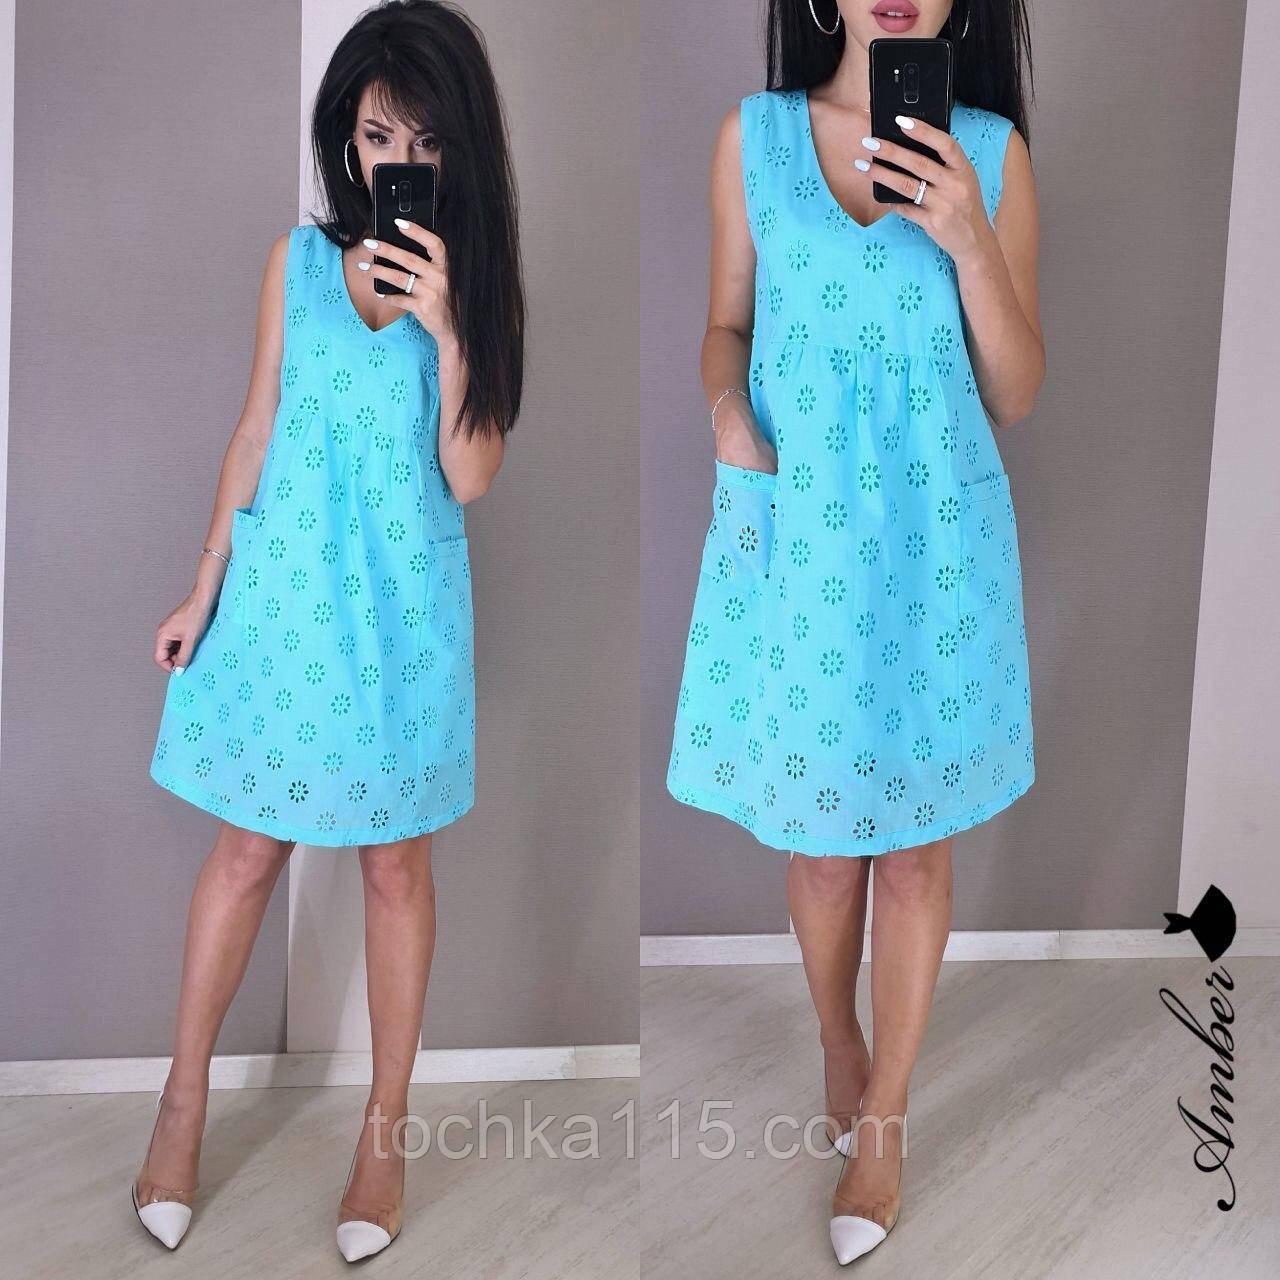 Стильное летнее платье, ткань батист, 42-44, 44-46 рр, голубой